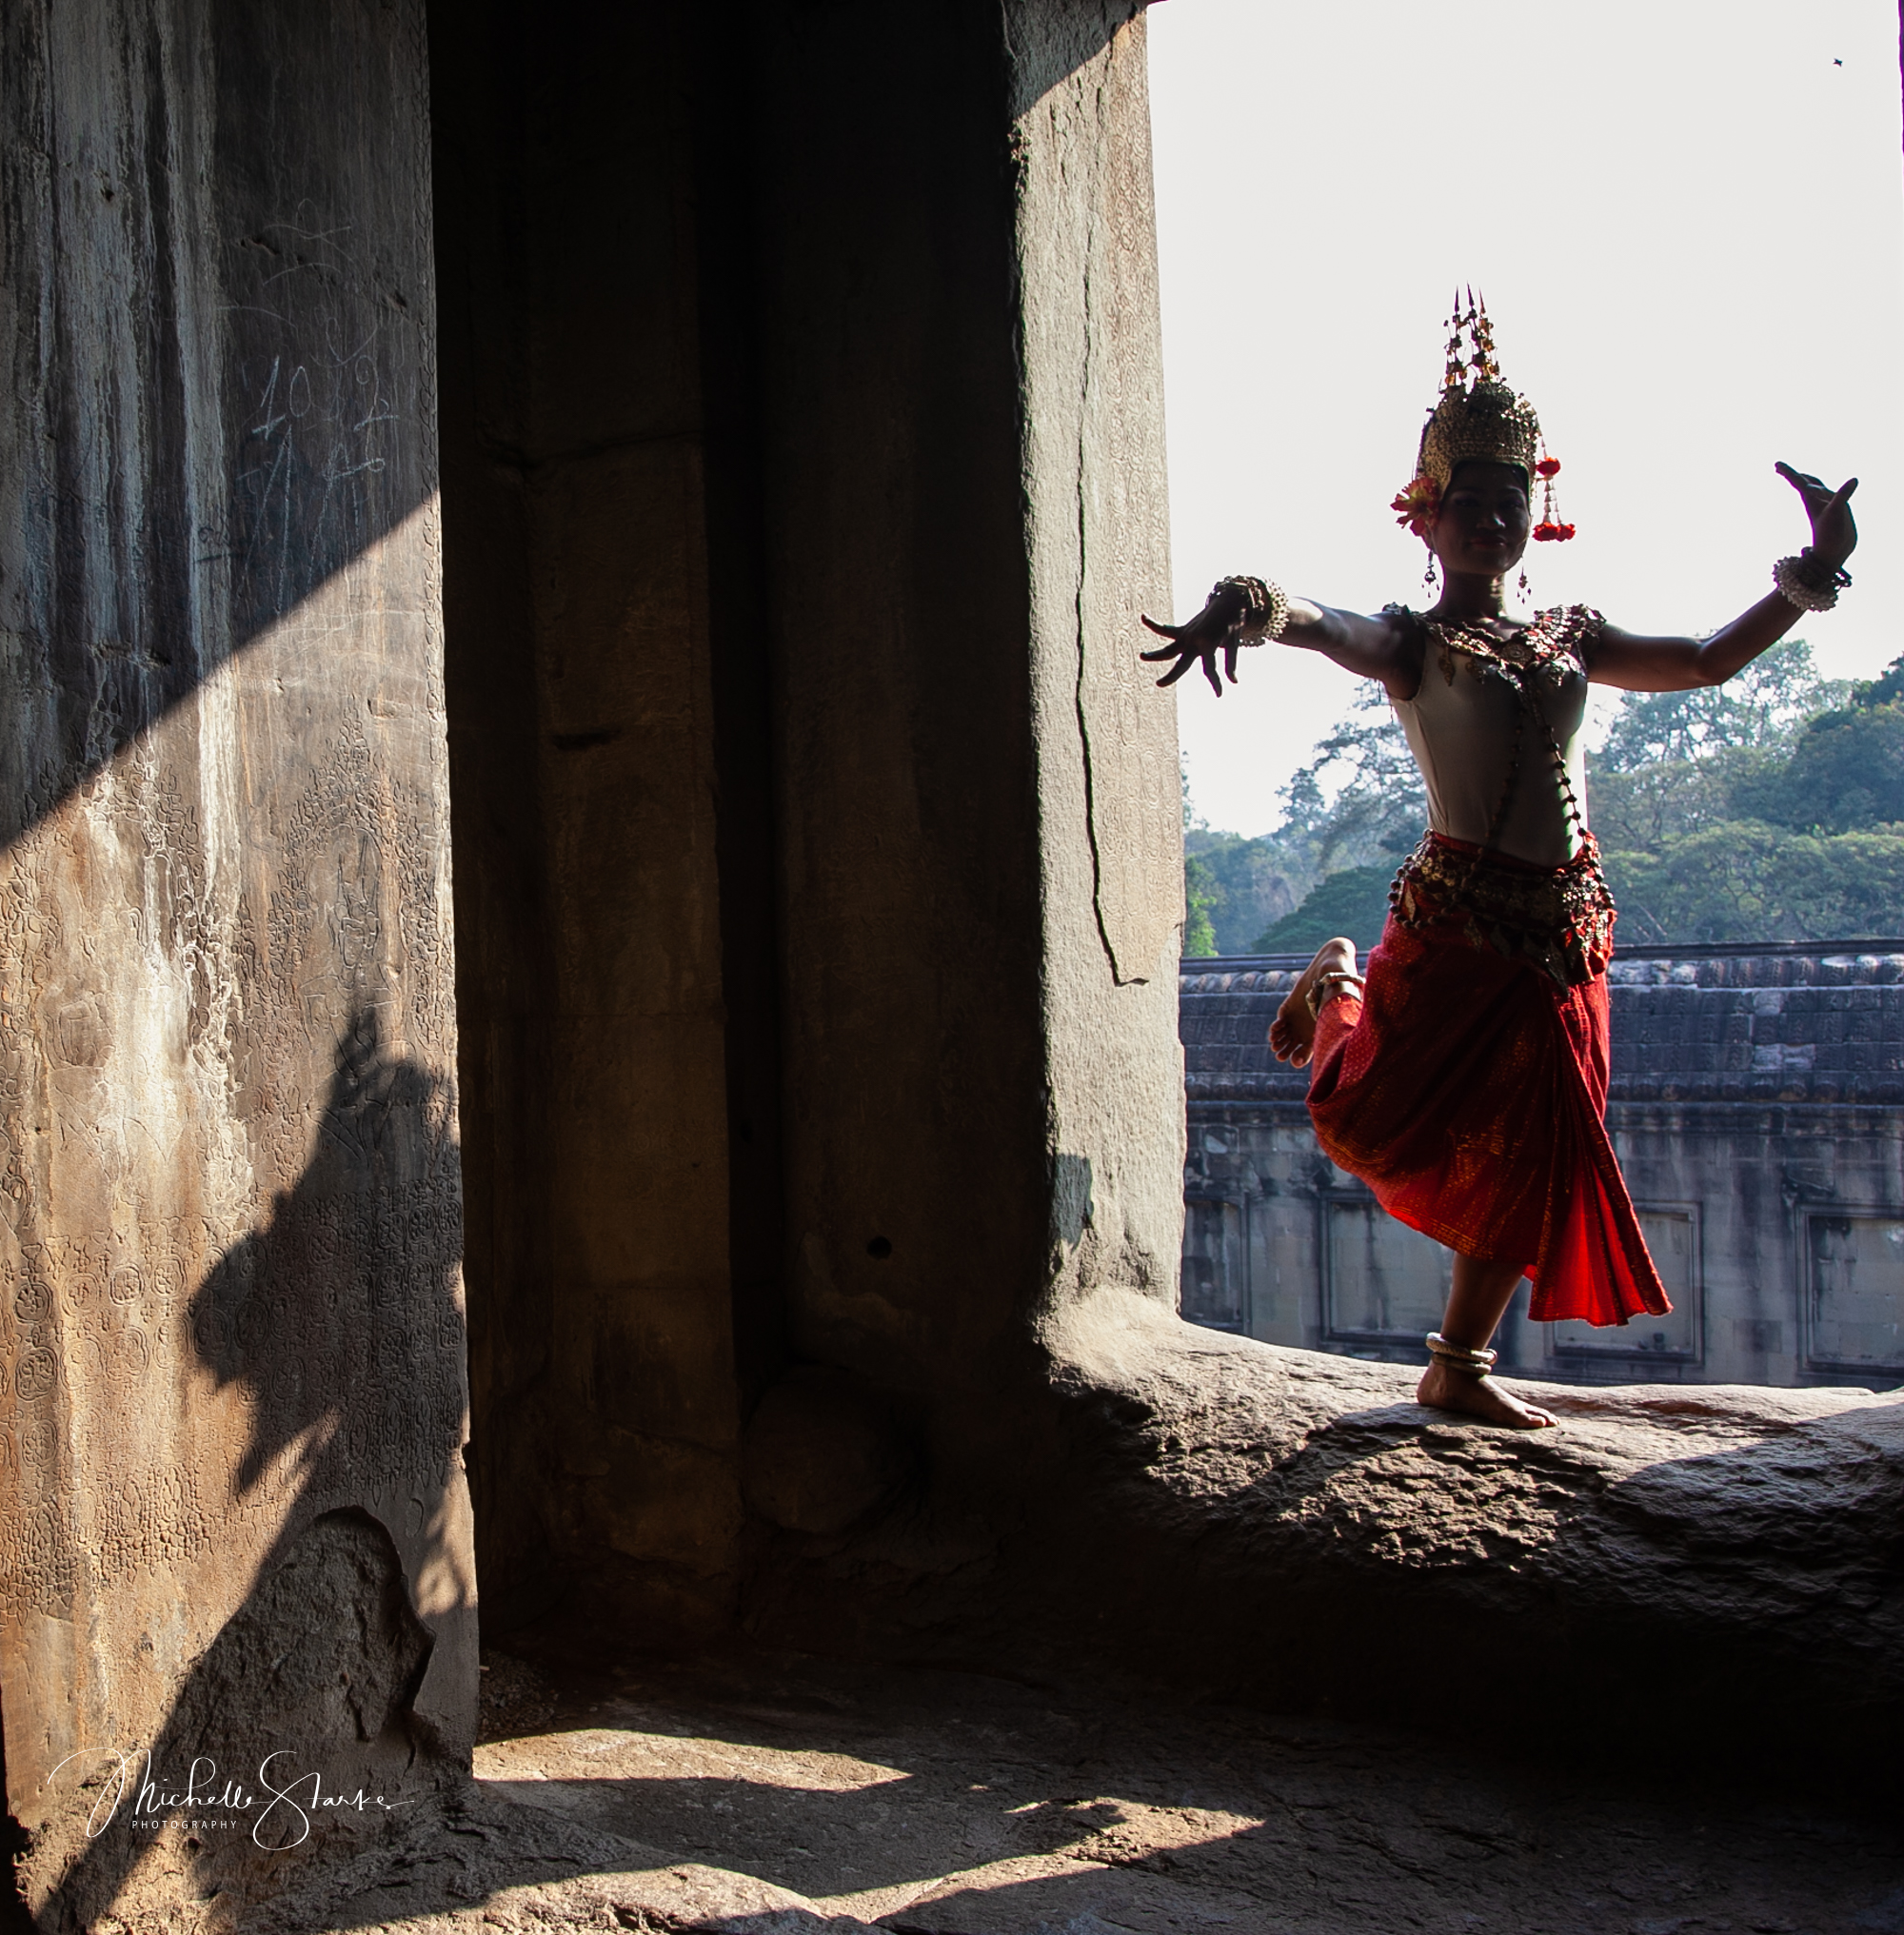 Cambodian Dancer, Angkor Wat, Cambodia